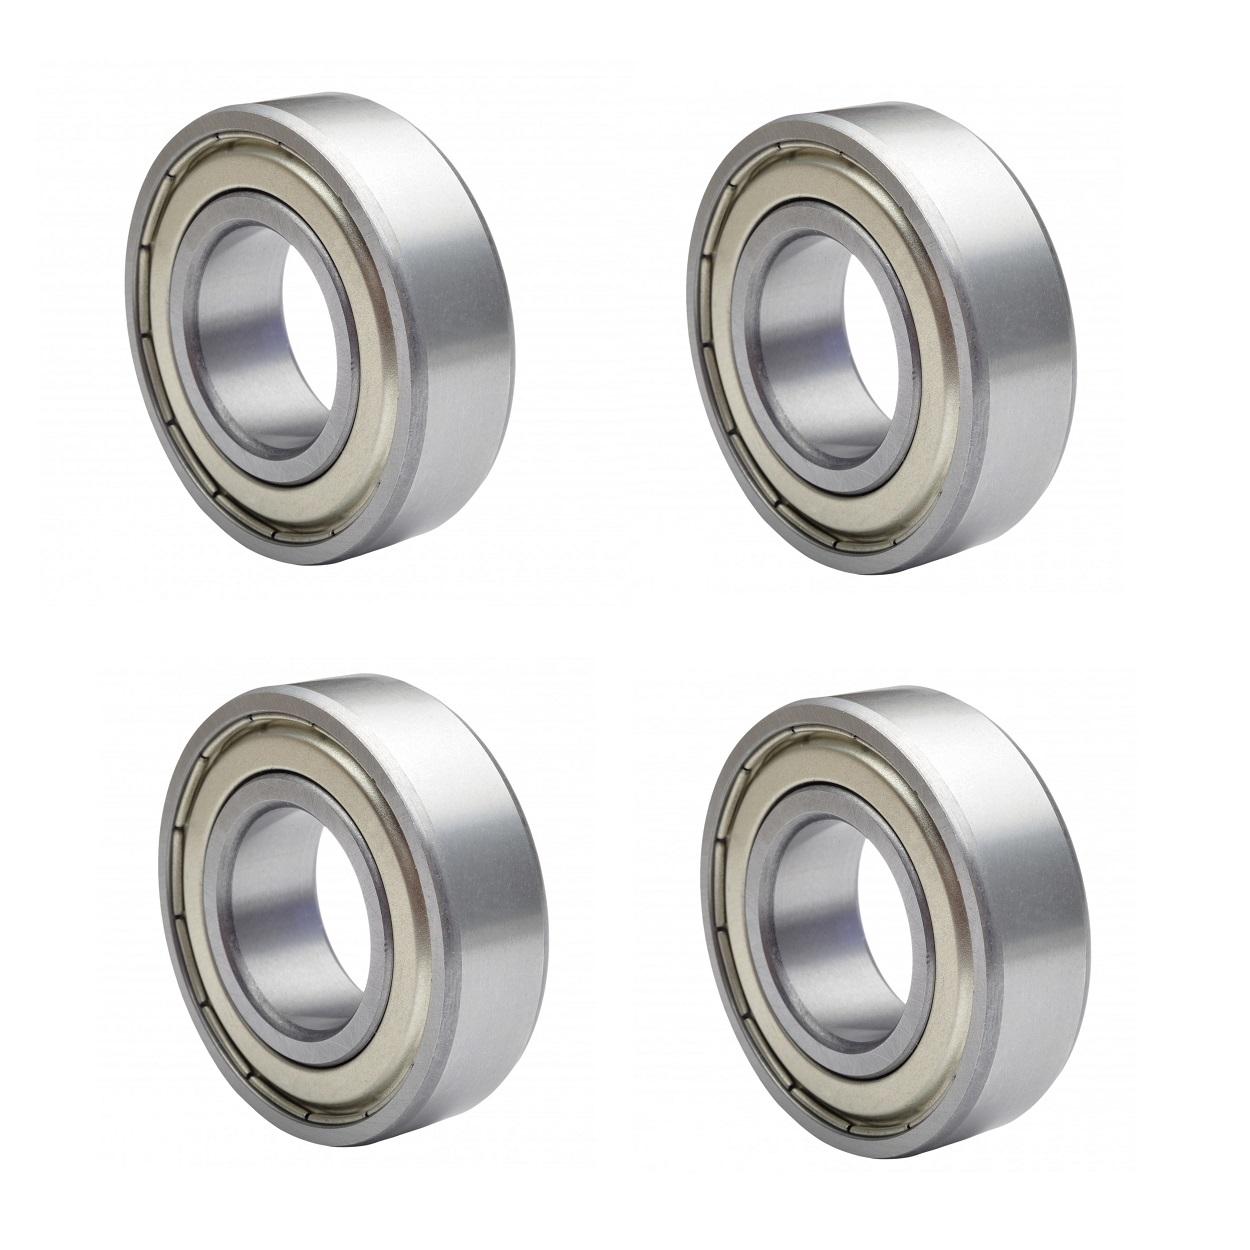 6000ZZ Bearing 10x26x8 Stainless Steel Bearings (Robu.in)